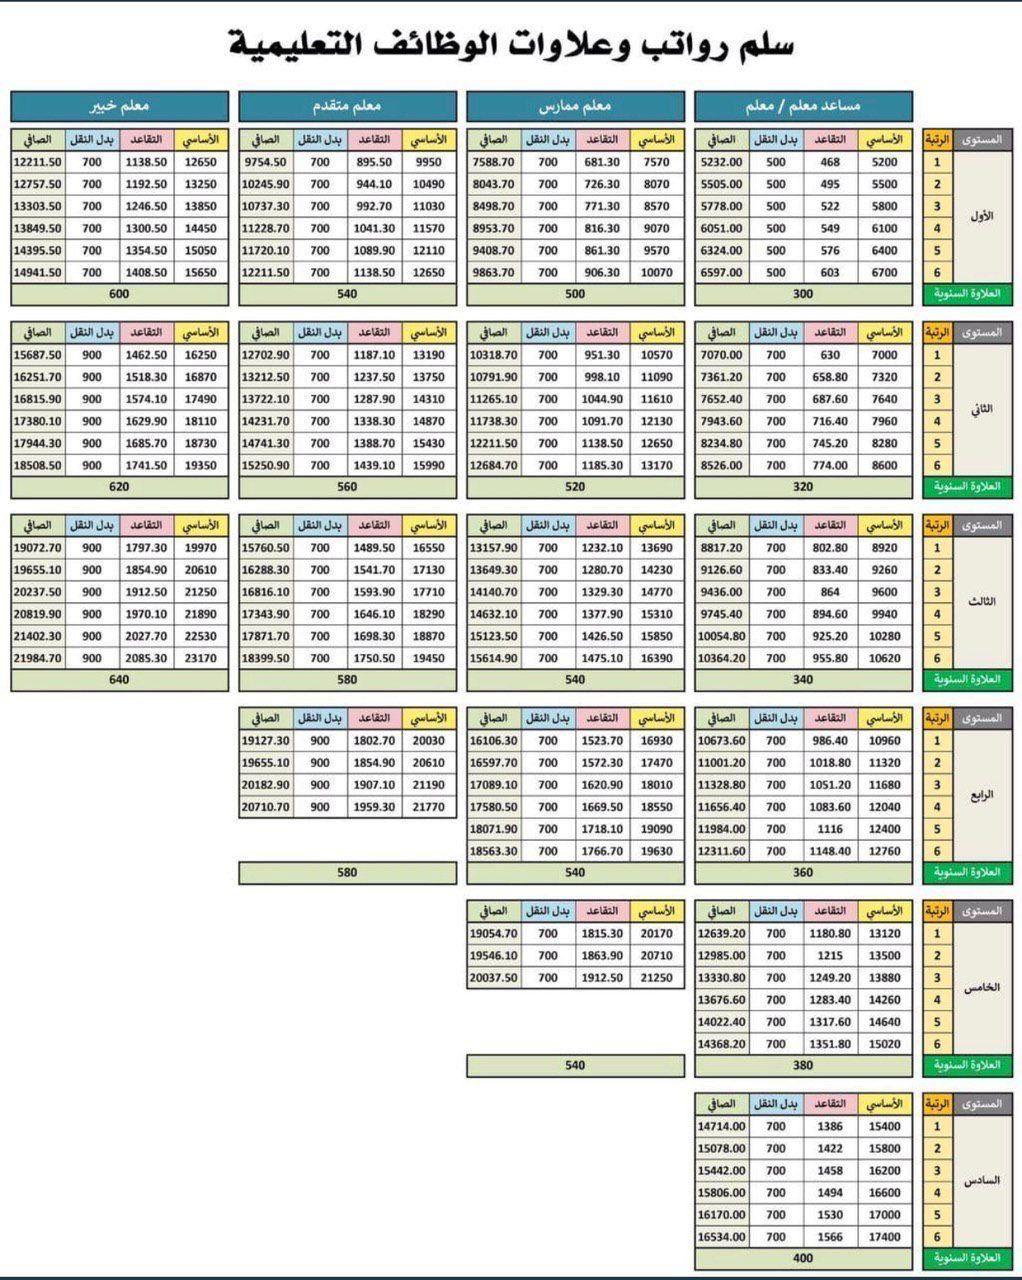 Pin By Bedo On الارشاد الصحي Periodic Table Diagram